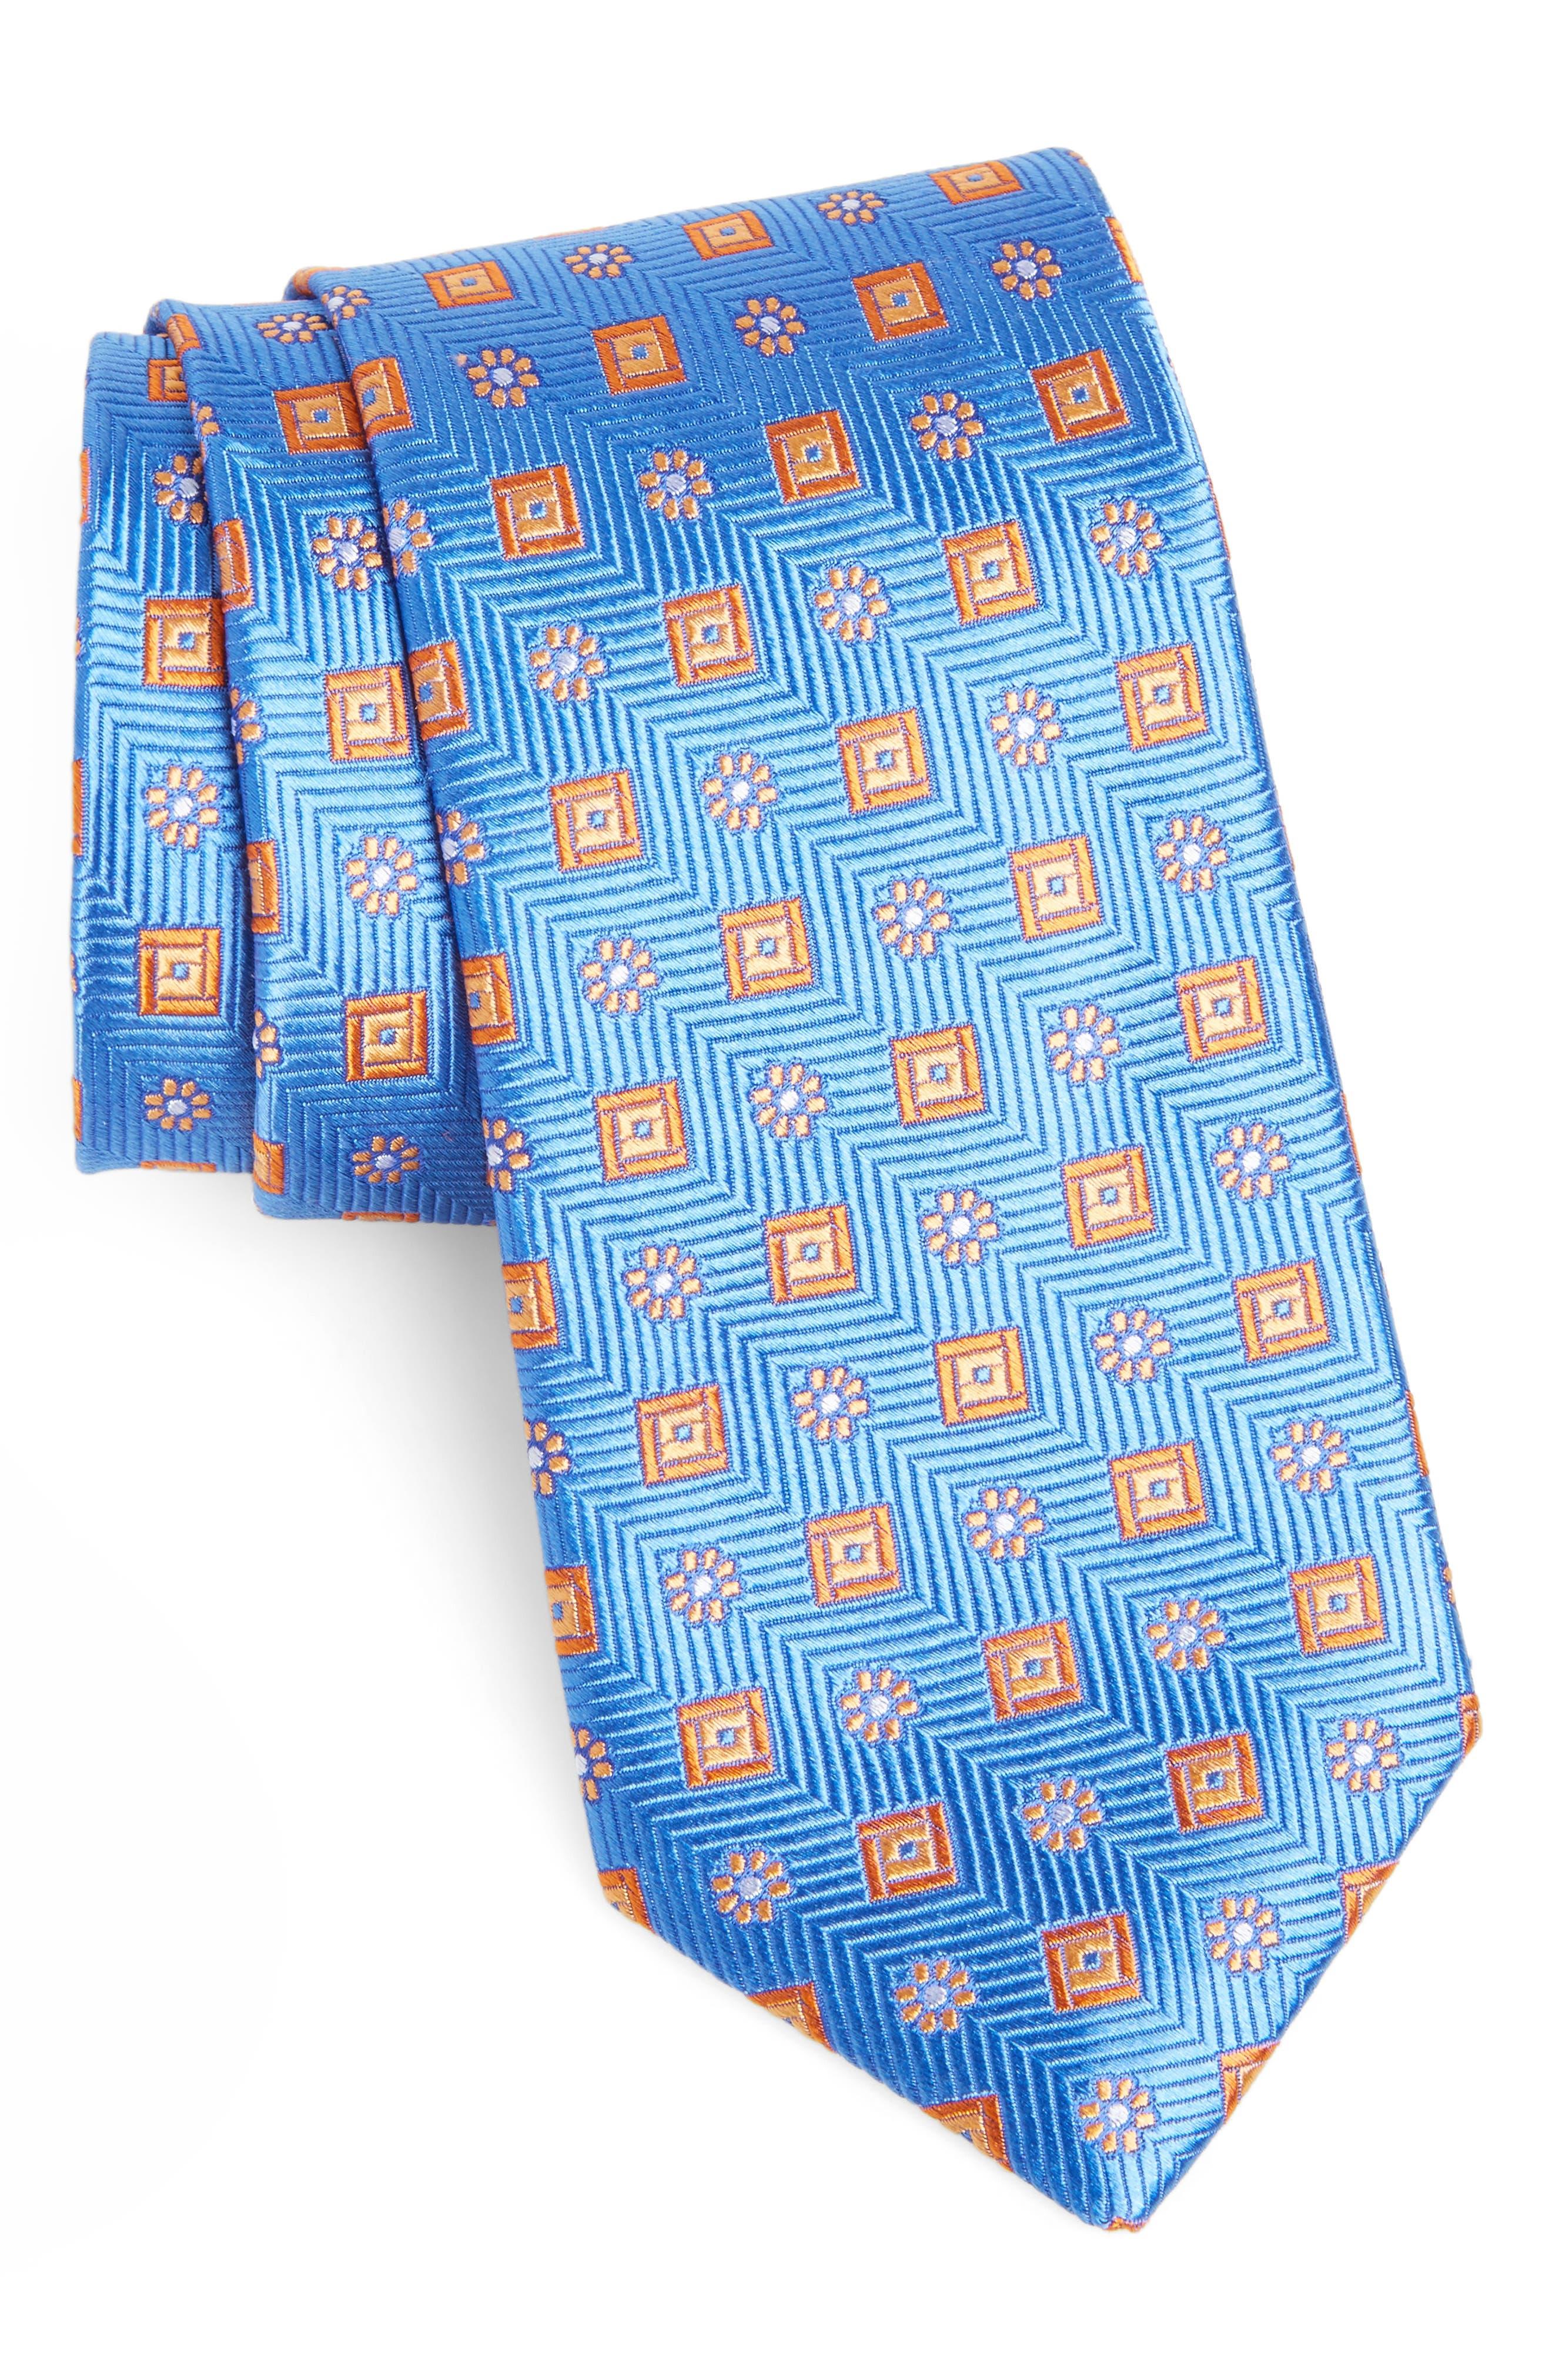 Alternate Image 1 Selected - Nordstrom Men's Shop Medallion Silk Tie (X-Long)